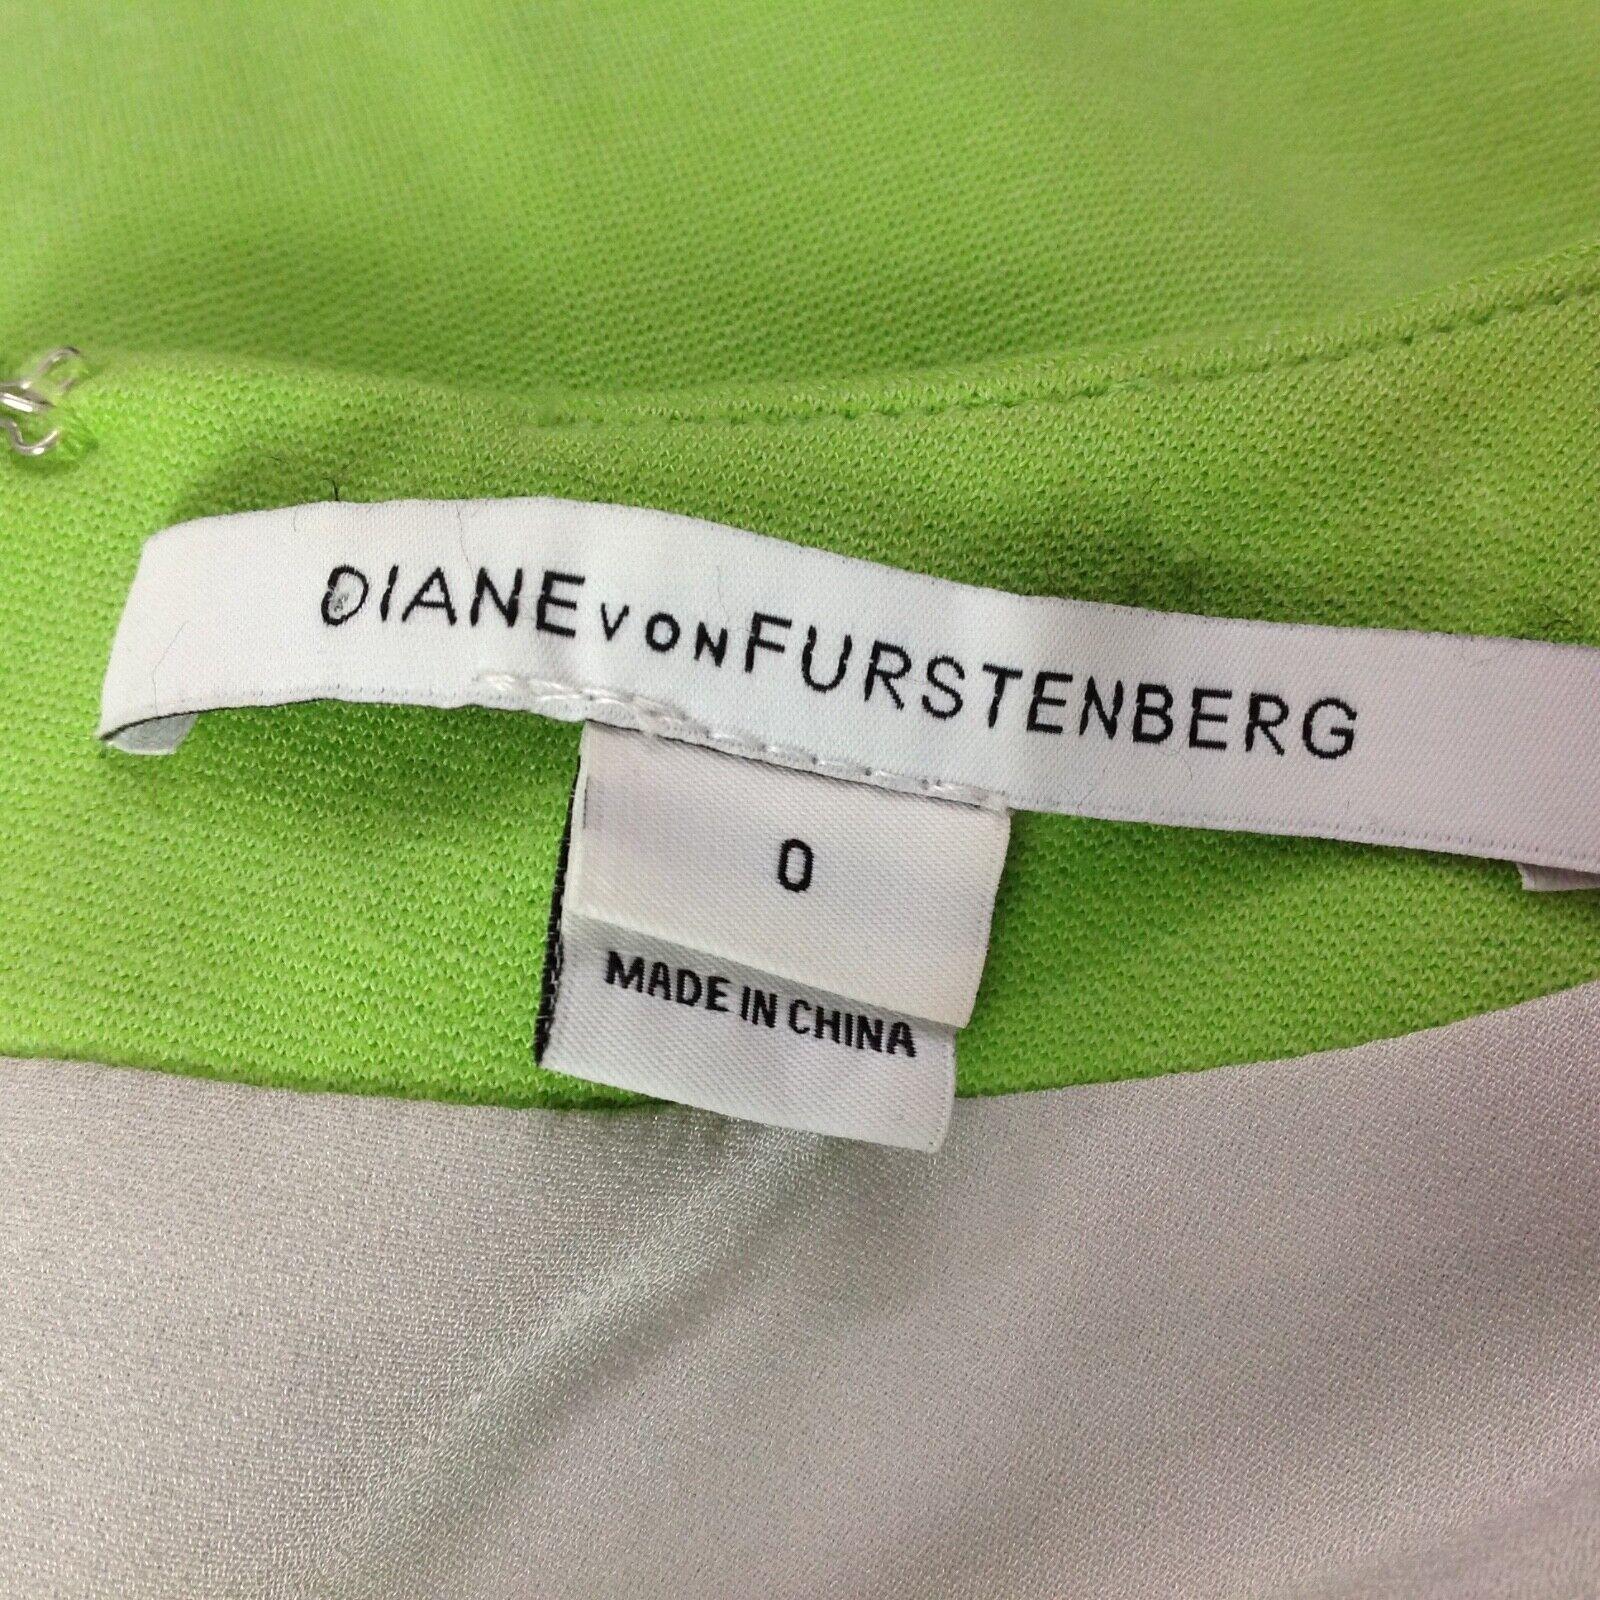 Diana von Furstenberg Agatha Knit Suiting Lime Gr… - image 8